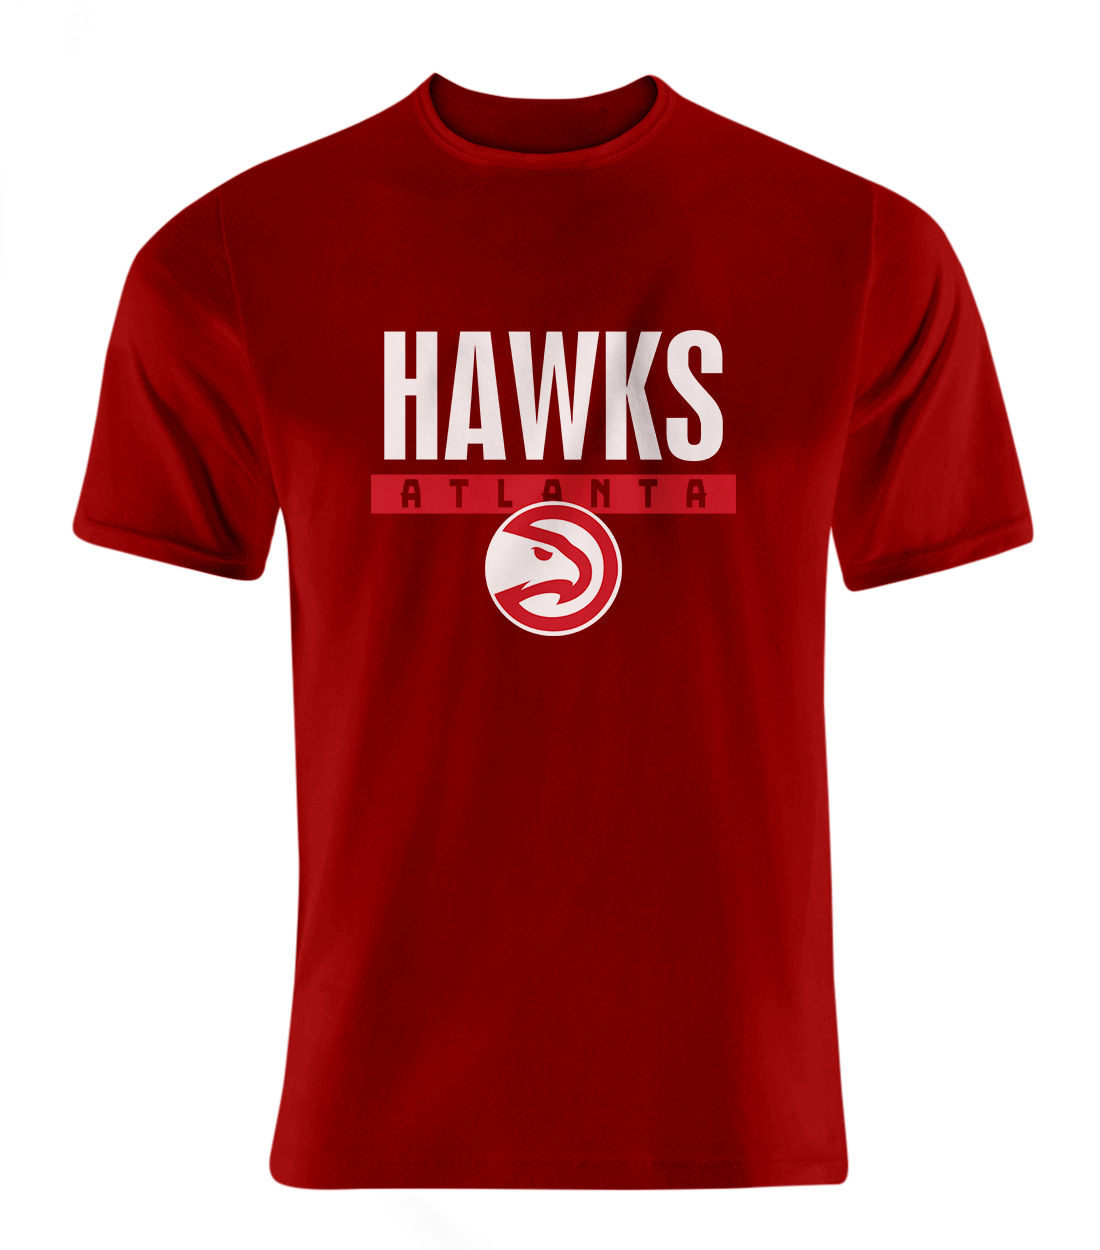 Atlanta Hawks Tshirt (TSH-RED-NP-19-NBA-ATL-HAWKS)